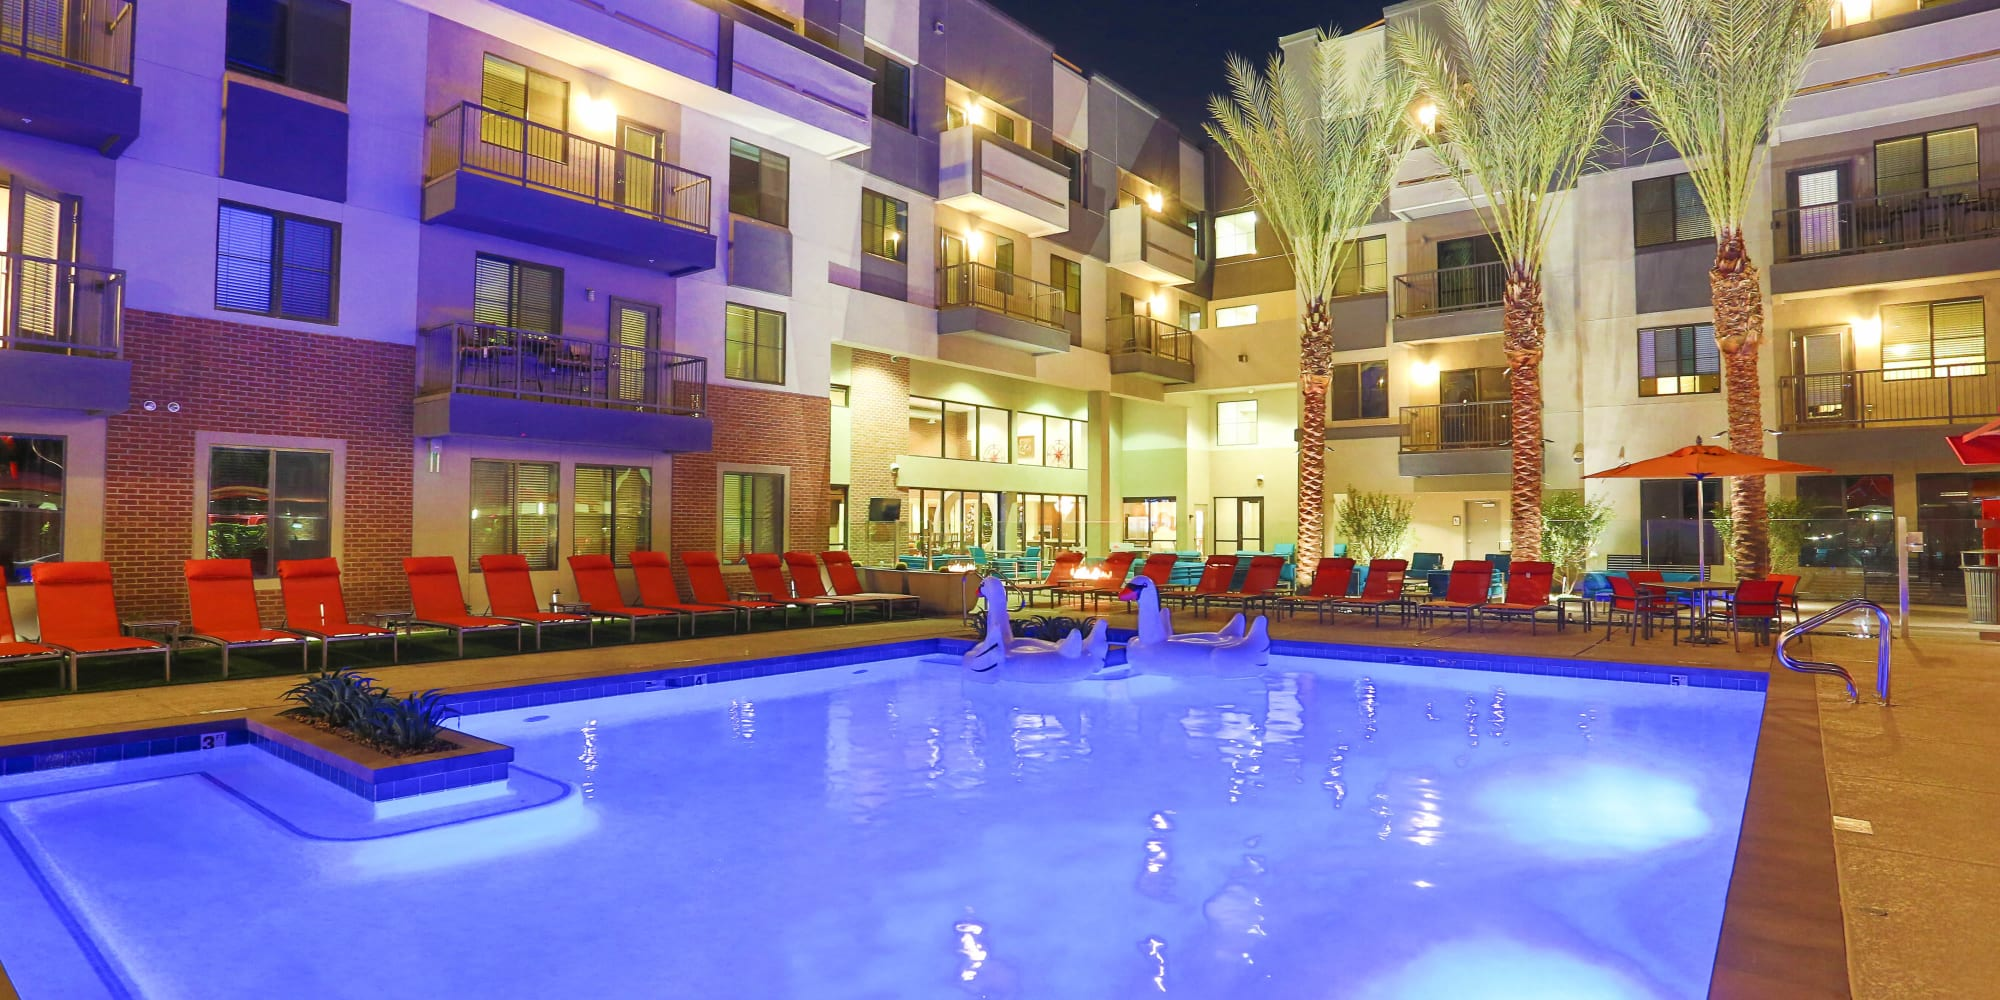 Olympus Steelyard apartments in Chandler, Arizona